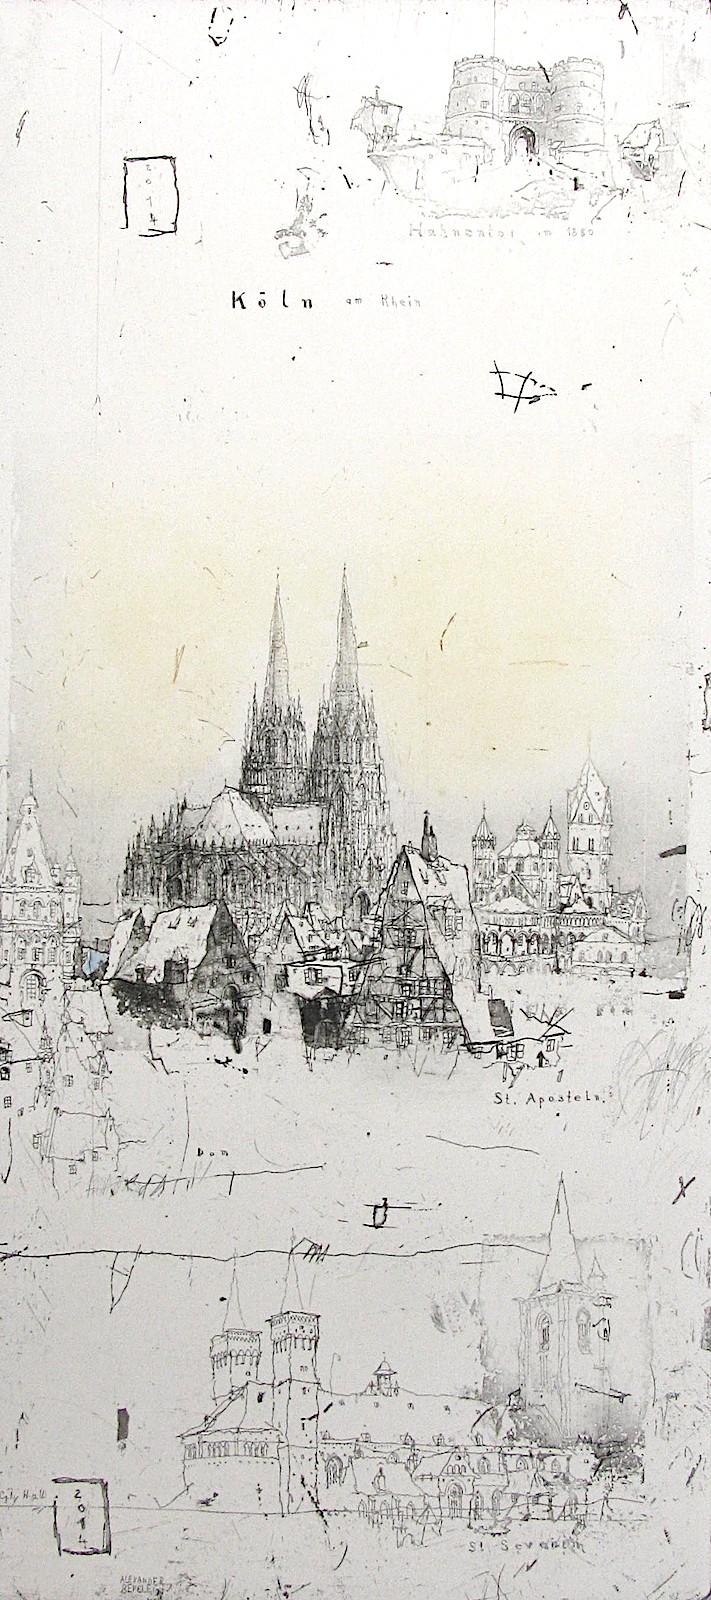 Köln - Befelein, Alexander - k-gk799